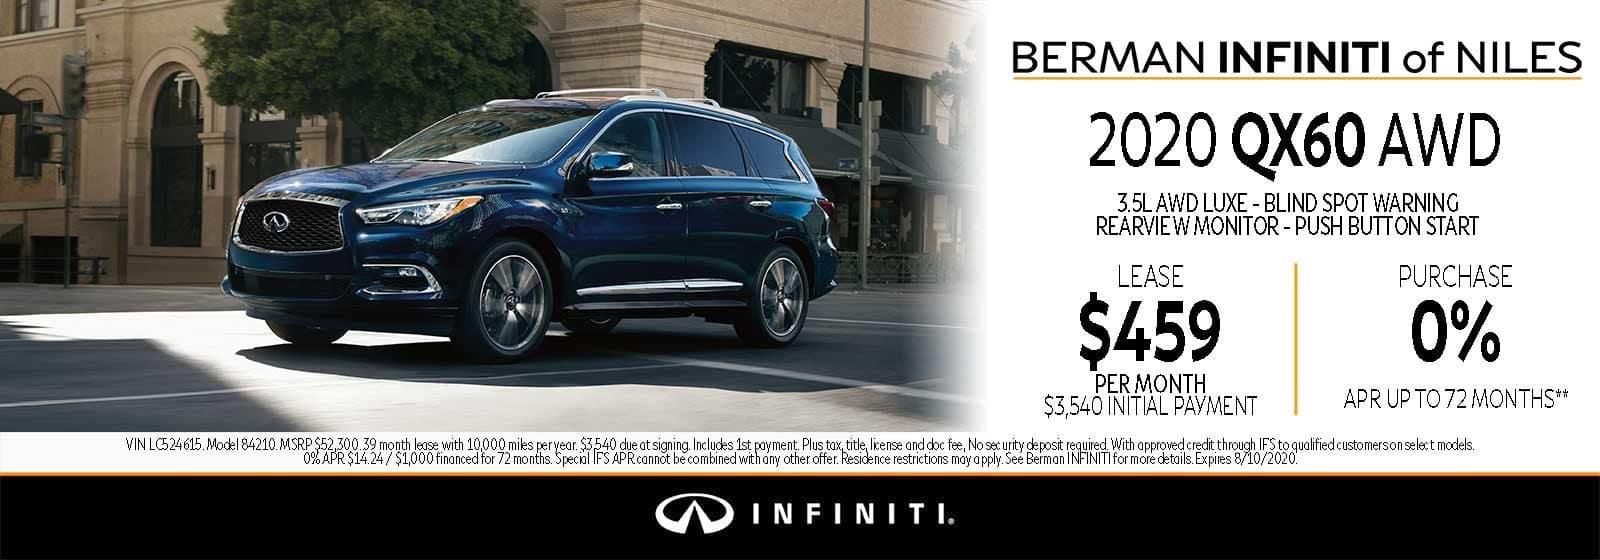 New 2020 INFINITI QX60 August Offer at Berman INFINITI of Niles!